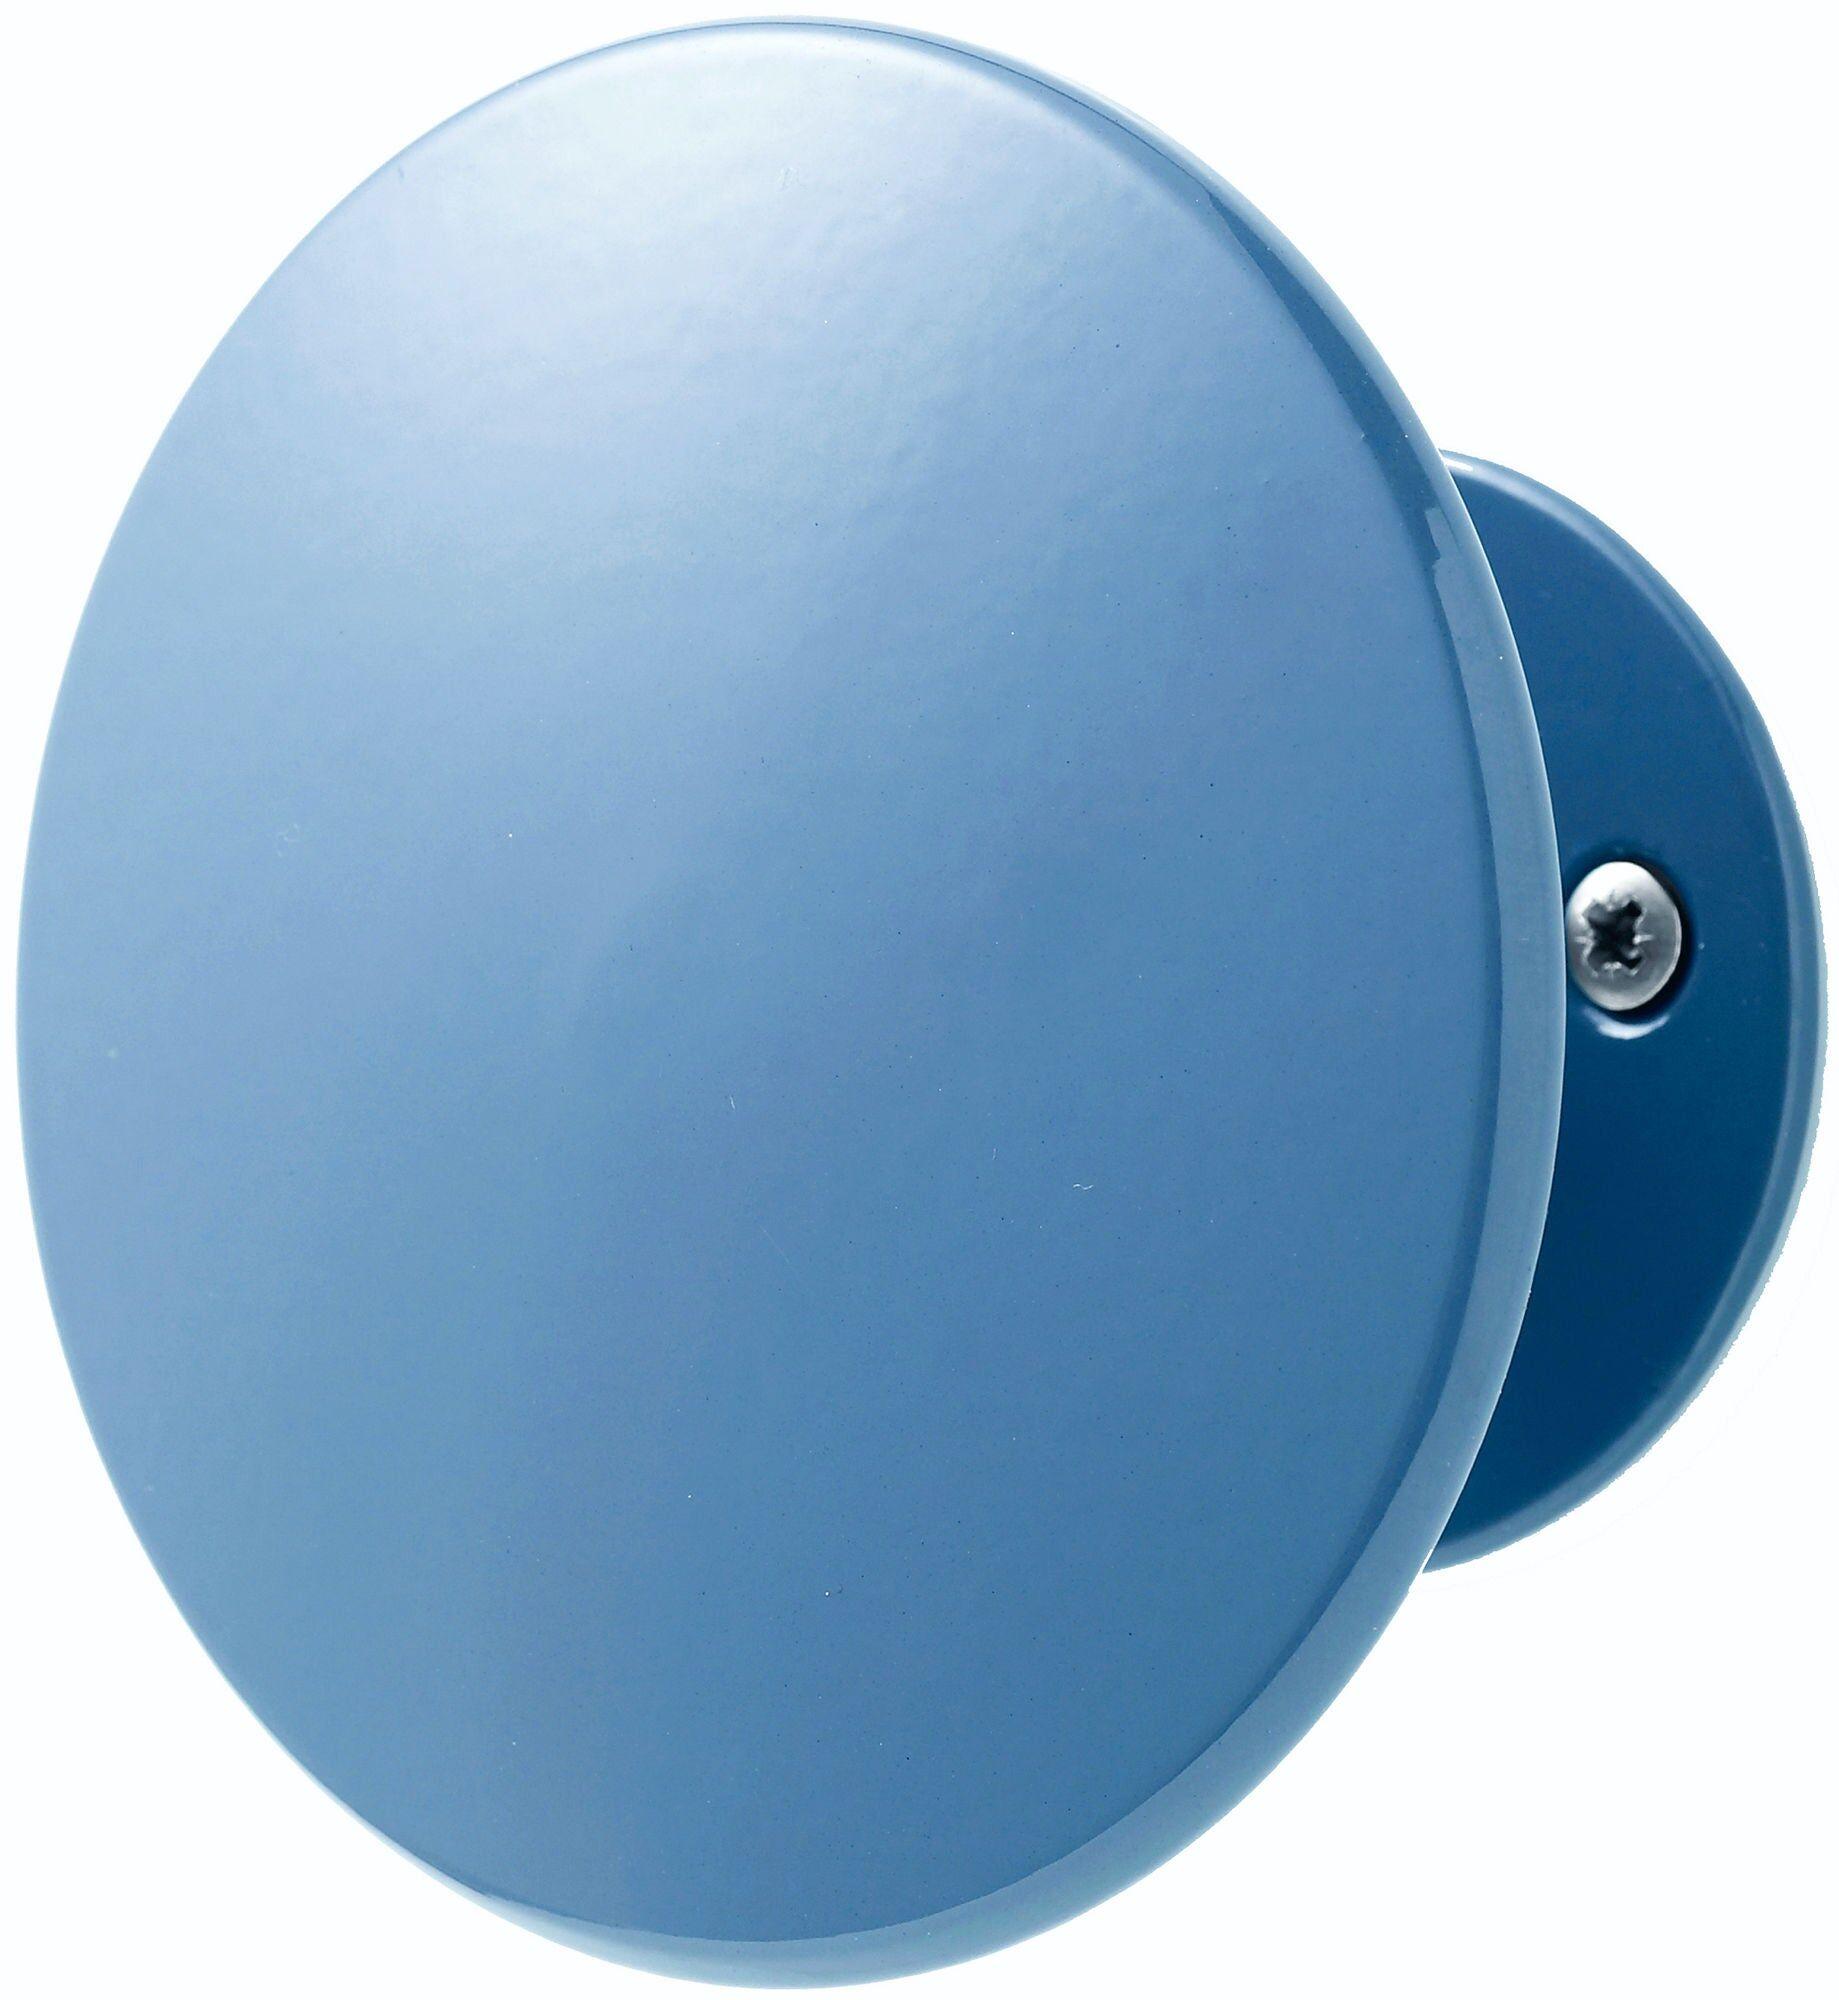 Superliving Uno Hook 9 cm, Blue Shadow